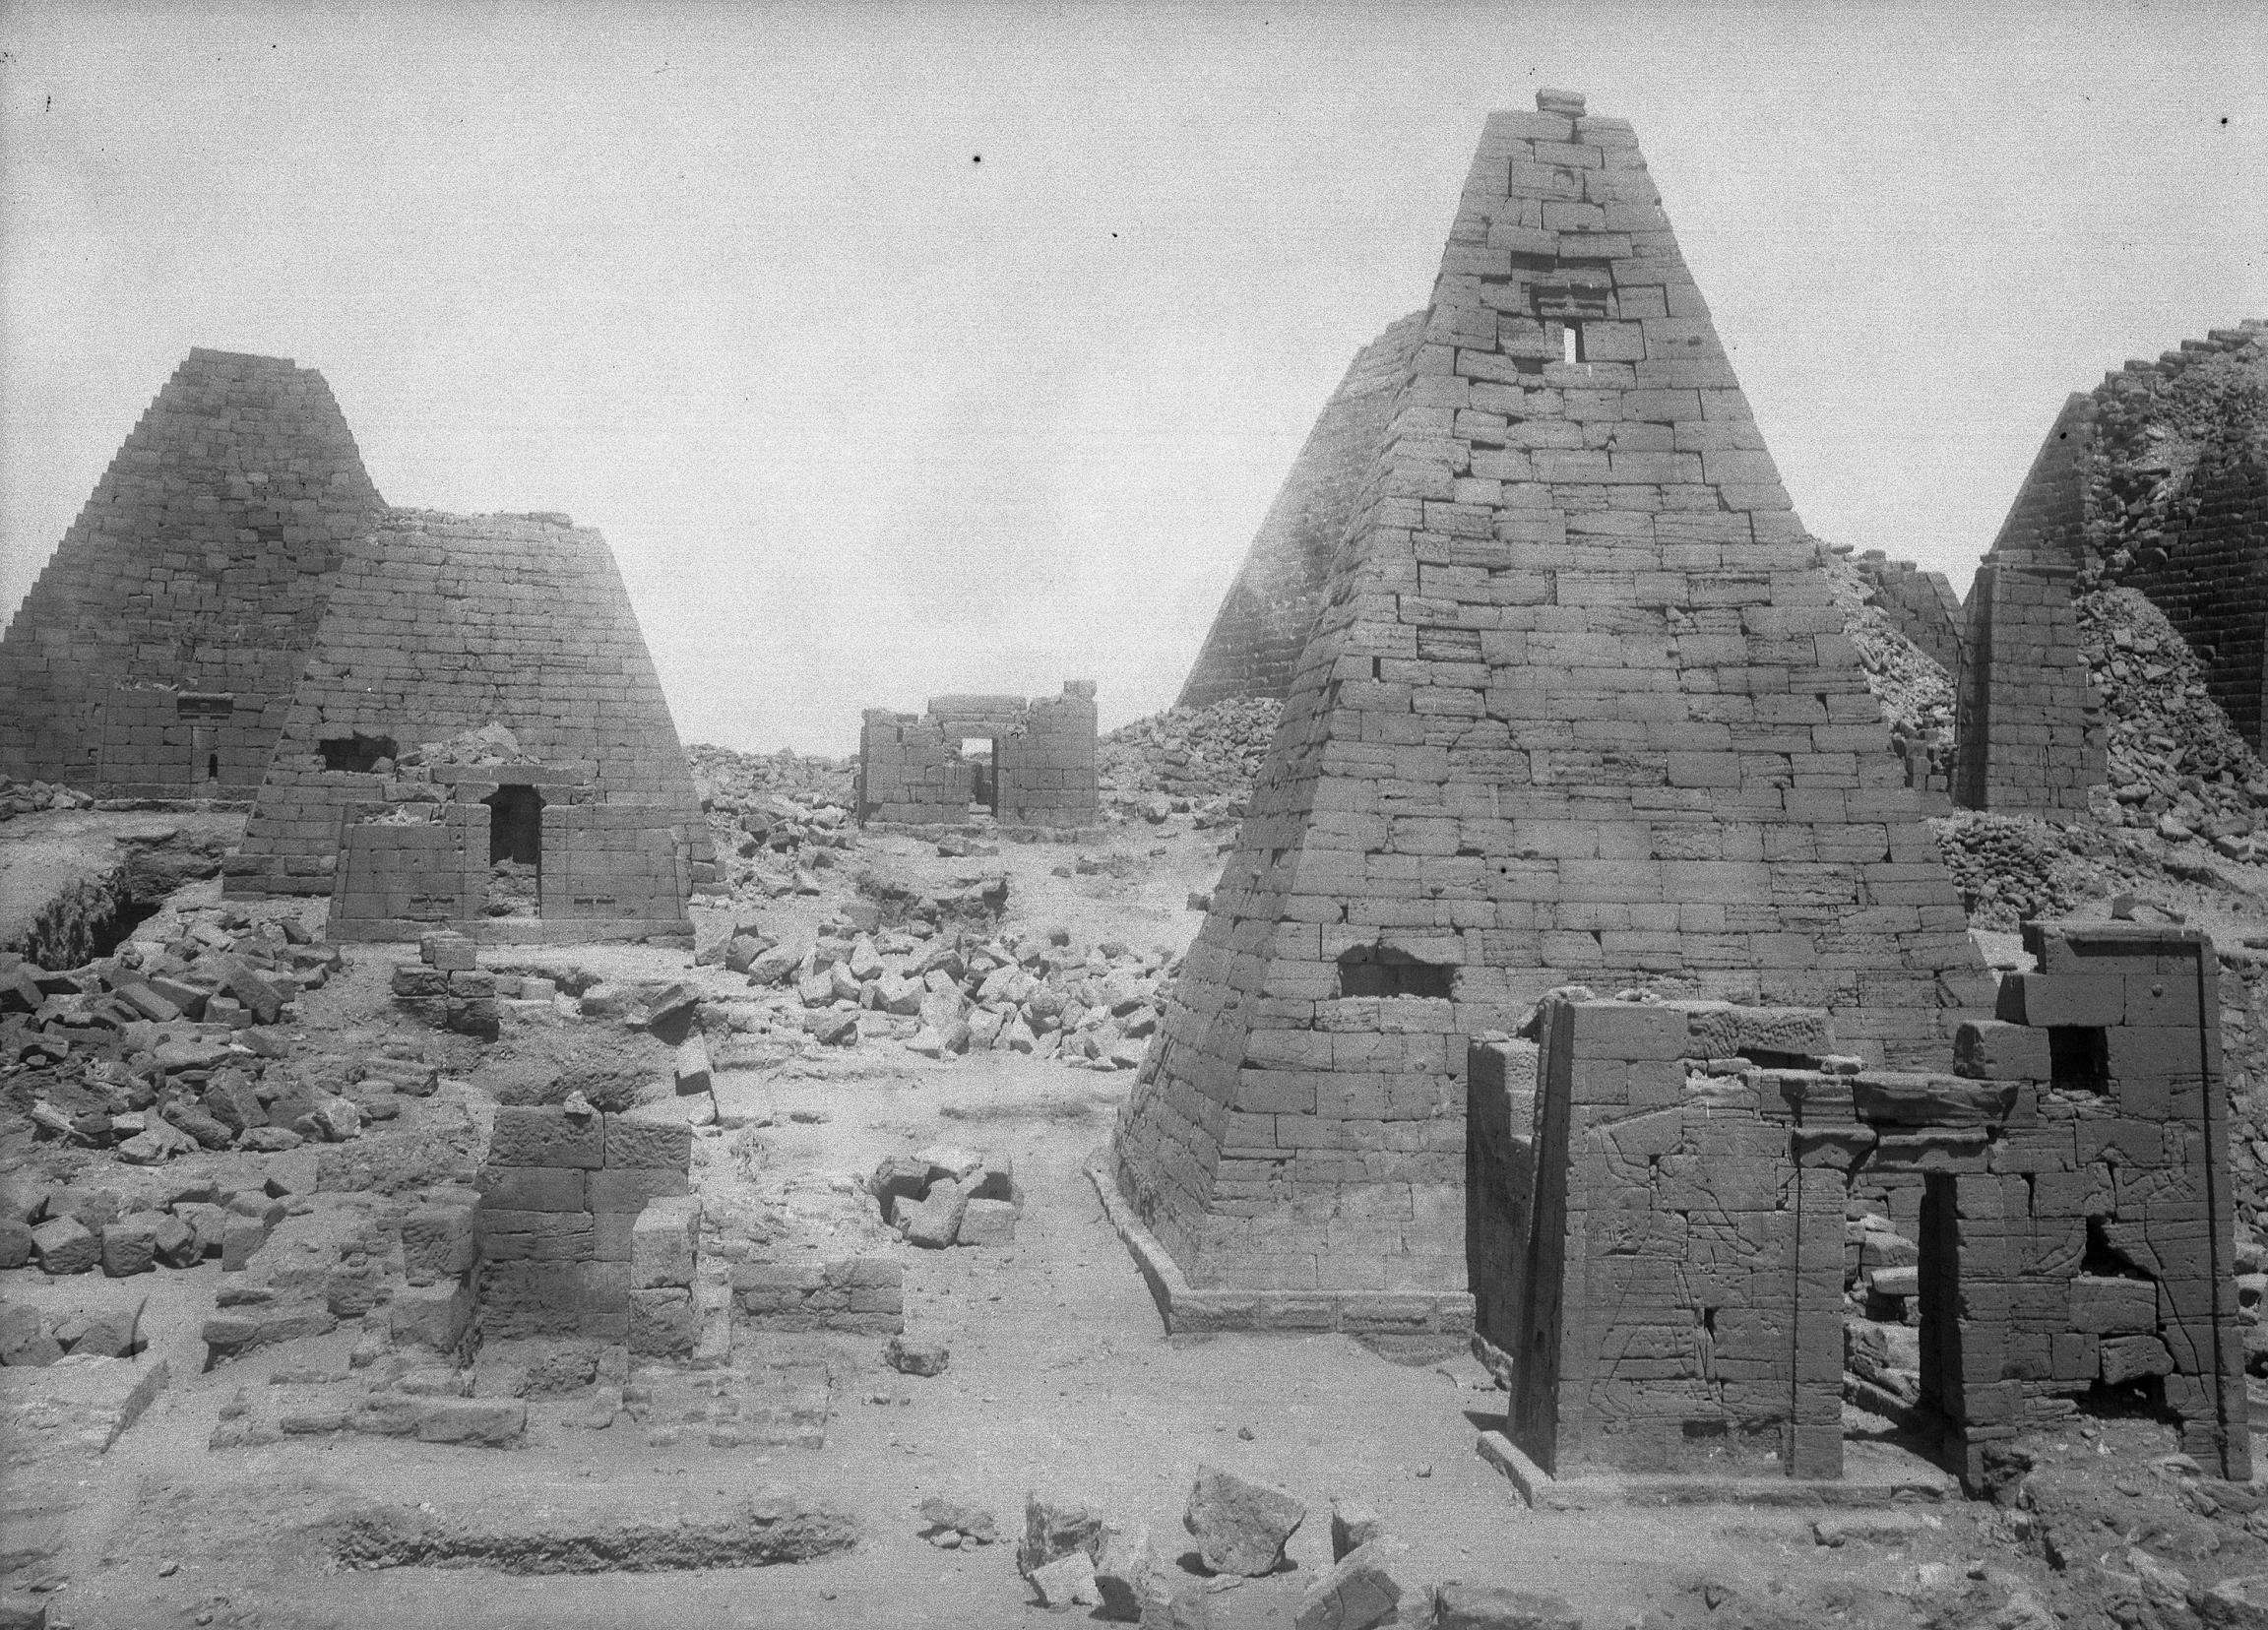 Begrawiya: North Cemetery at Meroe, Pyramids N 32 and N 19, April 12, 1921